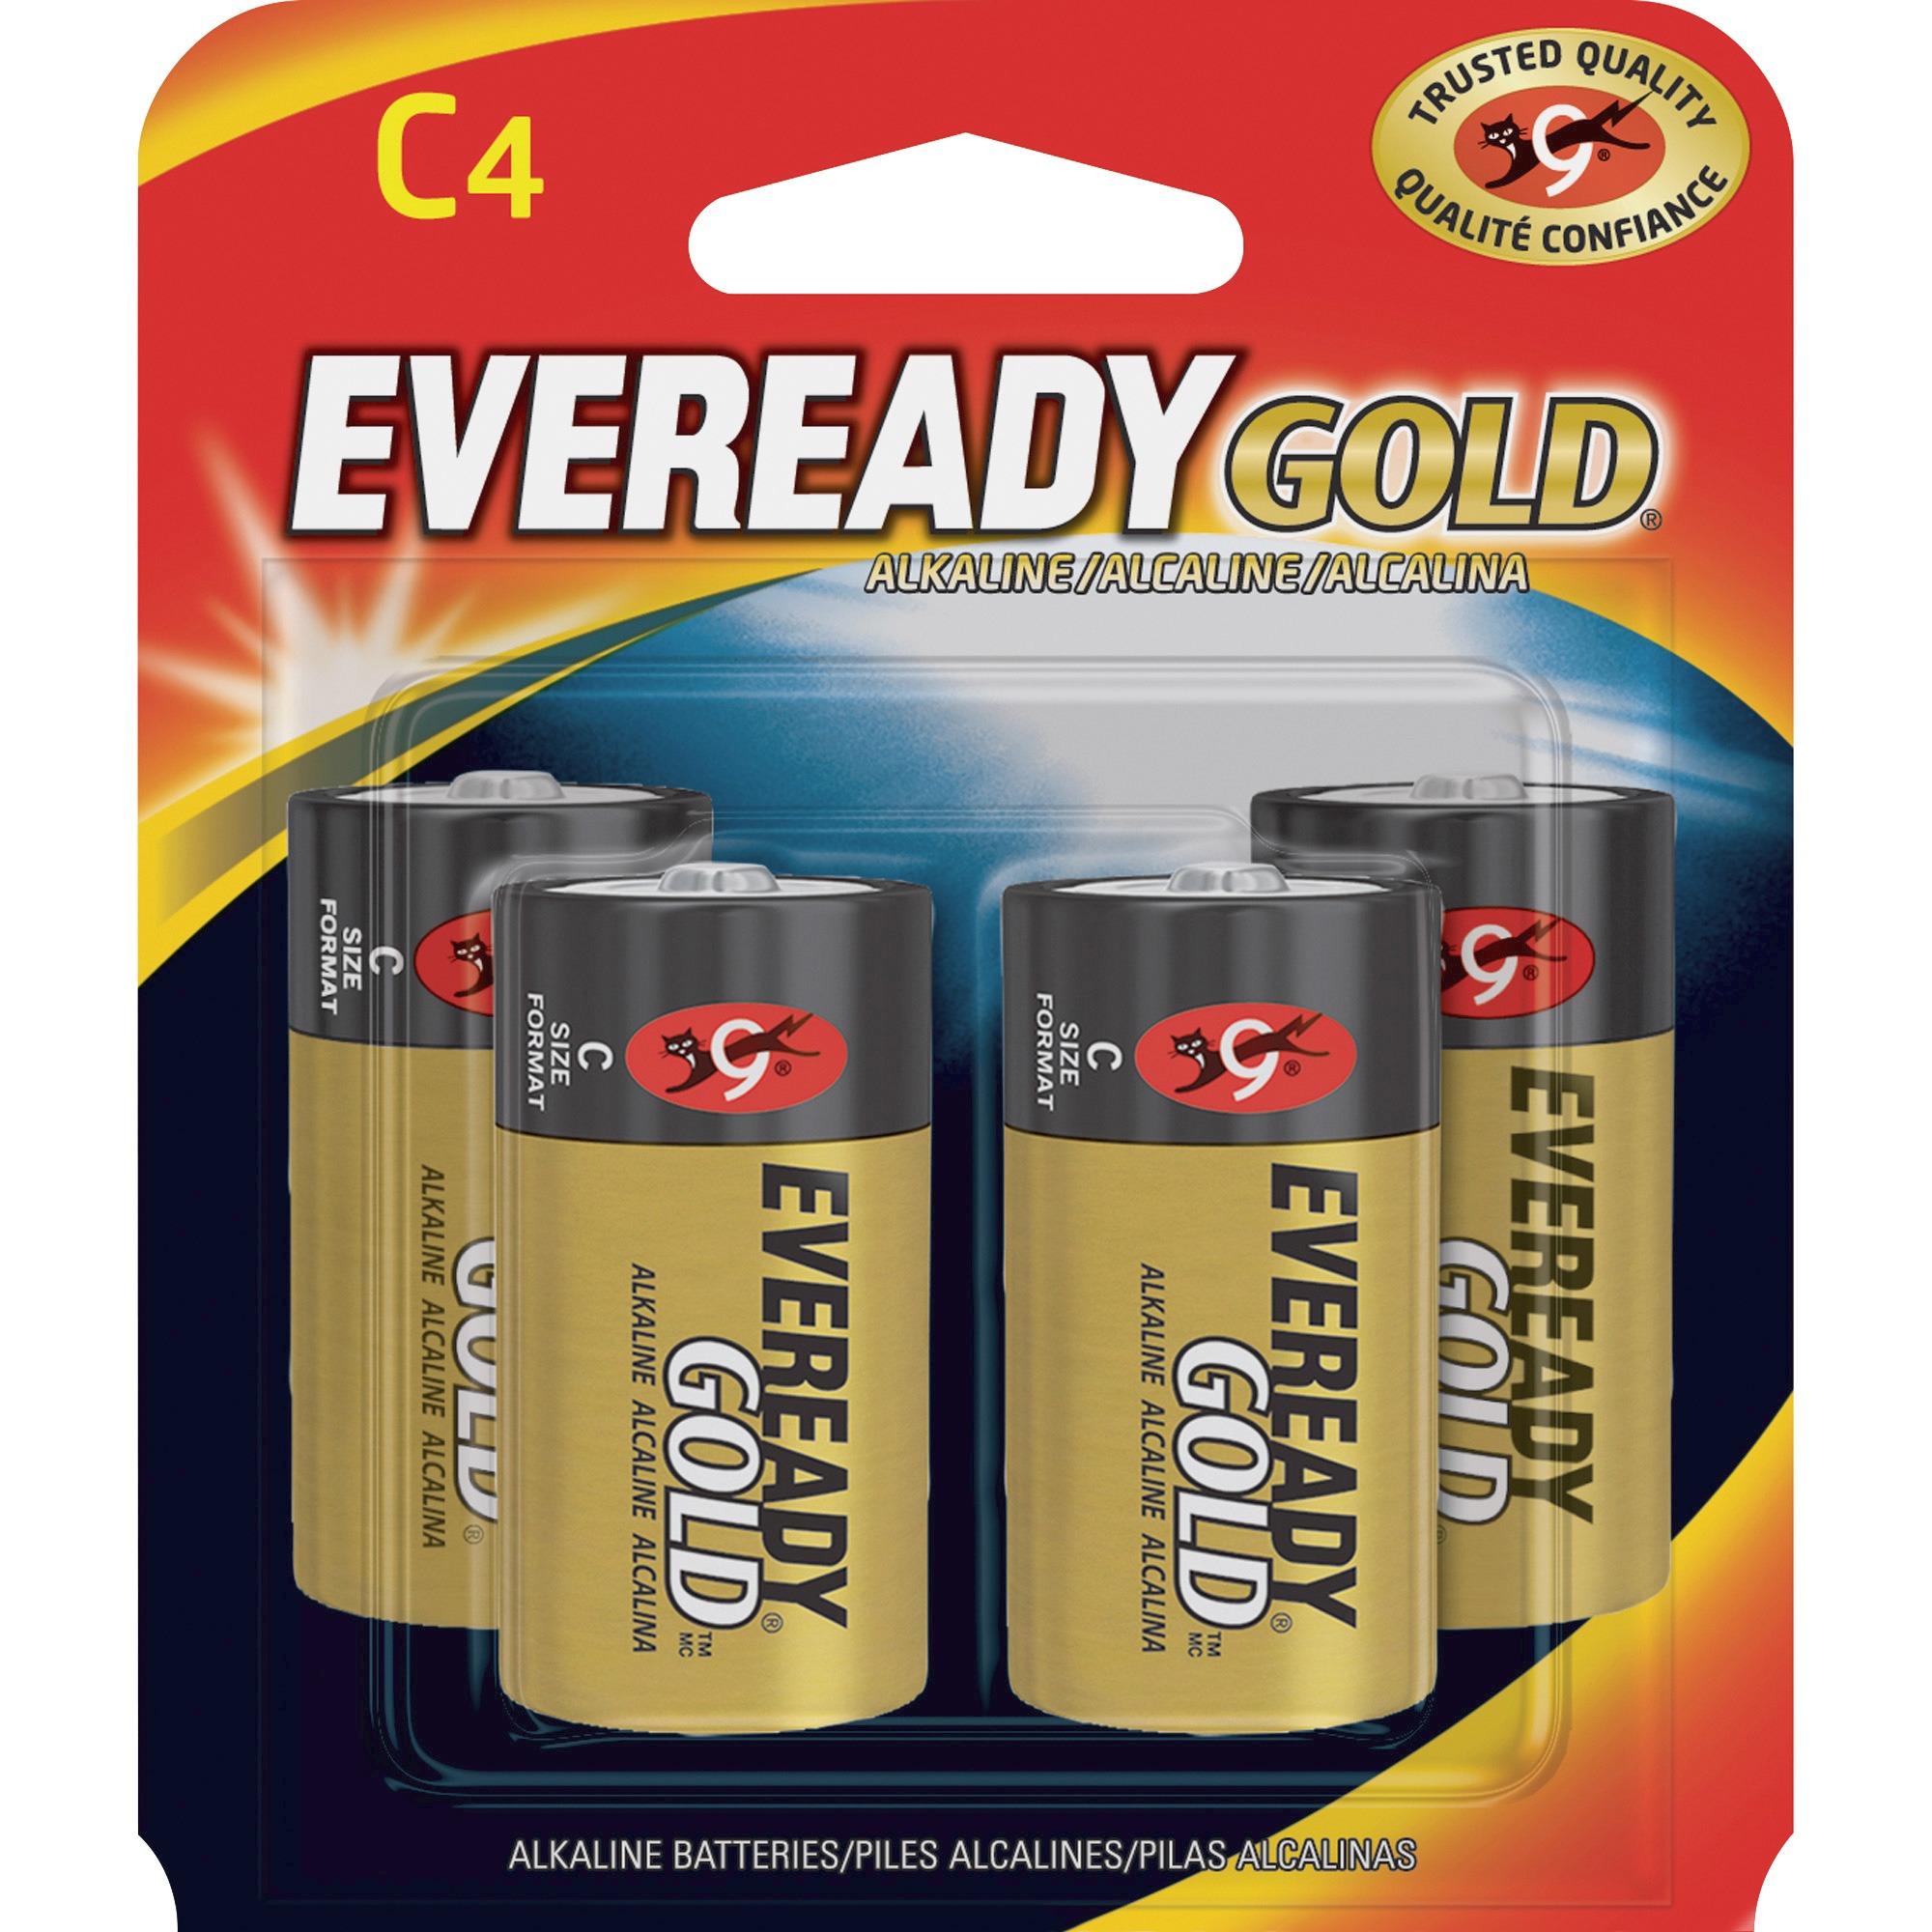 Energizer, EVEA93BP4, Gold Alkaline C Batteries, 4 / Pack, Red